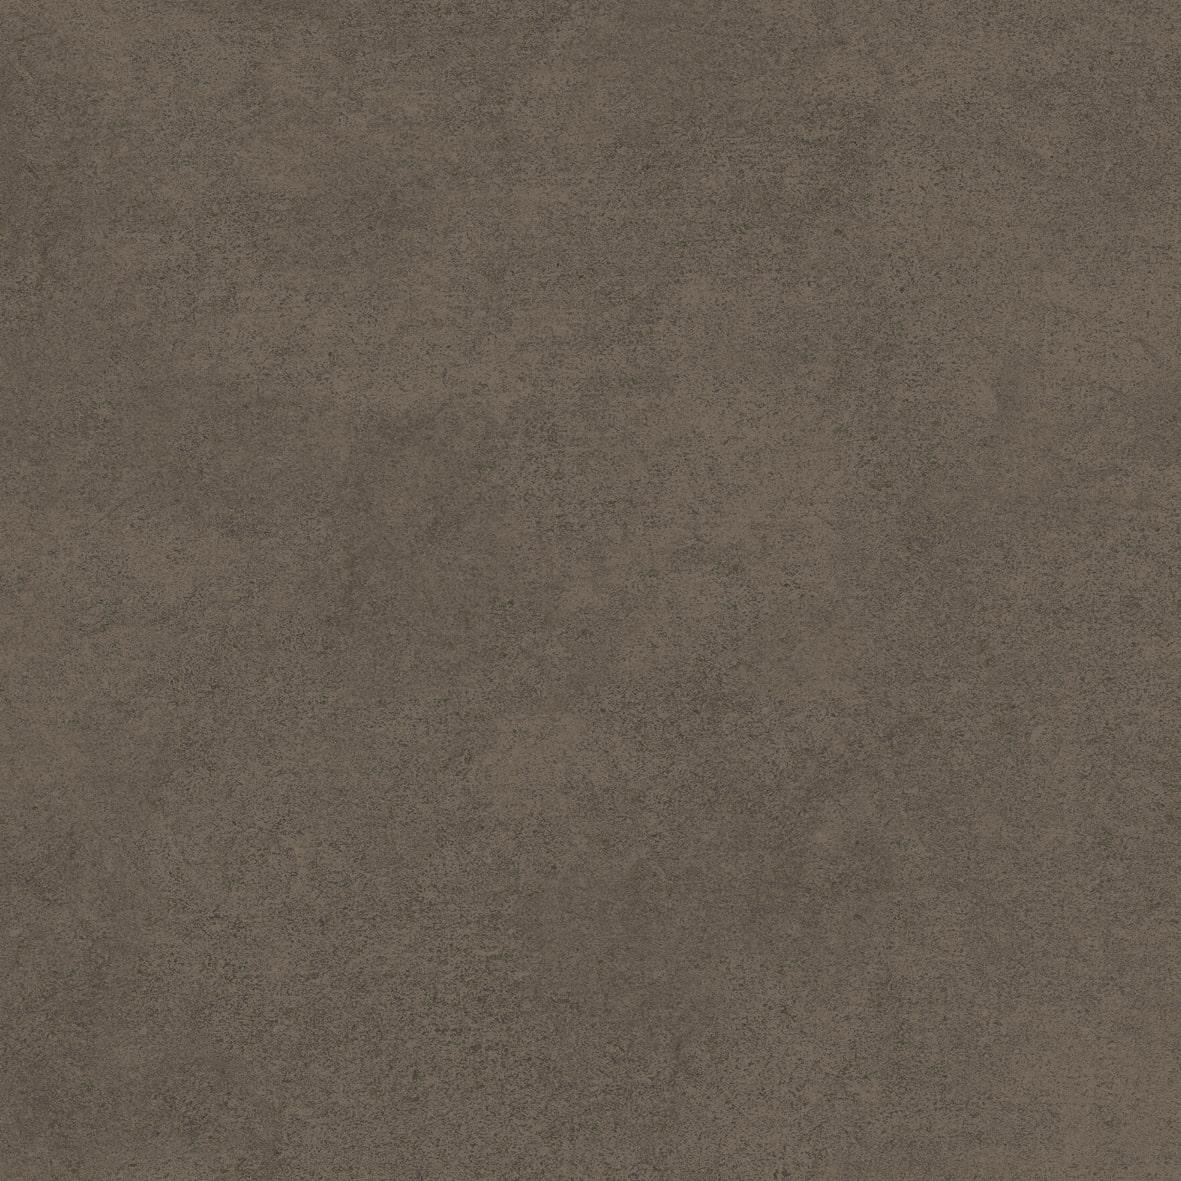 DGVT Cemento Brown